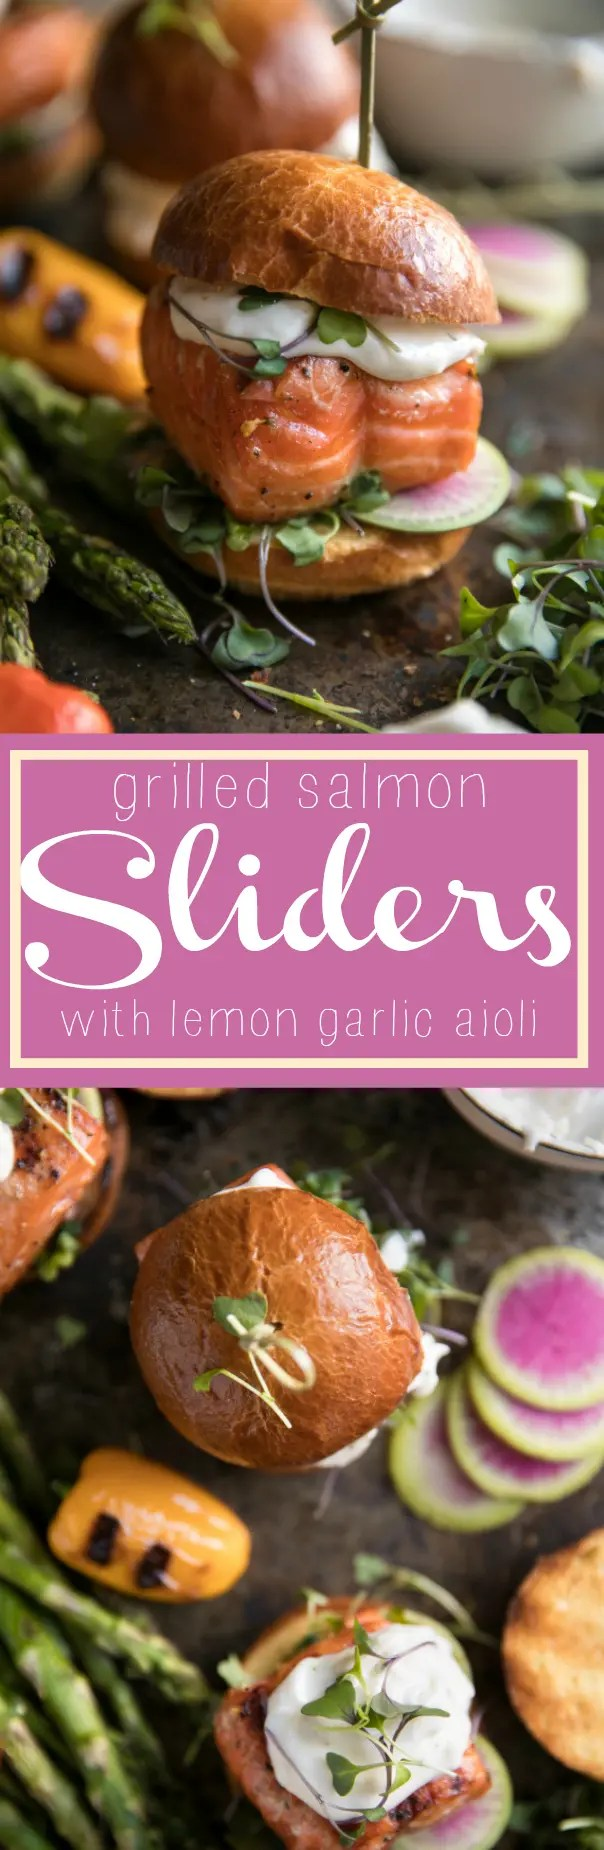 Grilled Salmon Burgers with Garlic Lemon Aioli via @theforkedspoon #ad #sliders #salmon #burgers #aioli #sandwich #fish #grilled #easyrecipe @philipshome